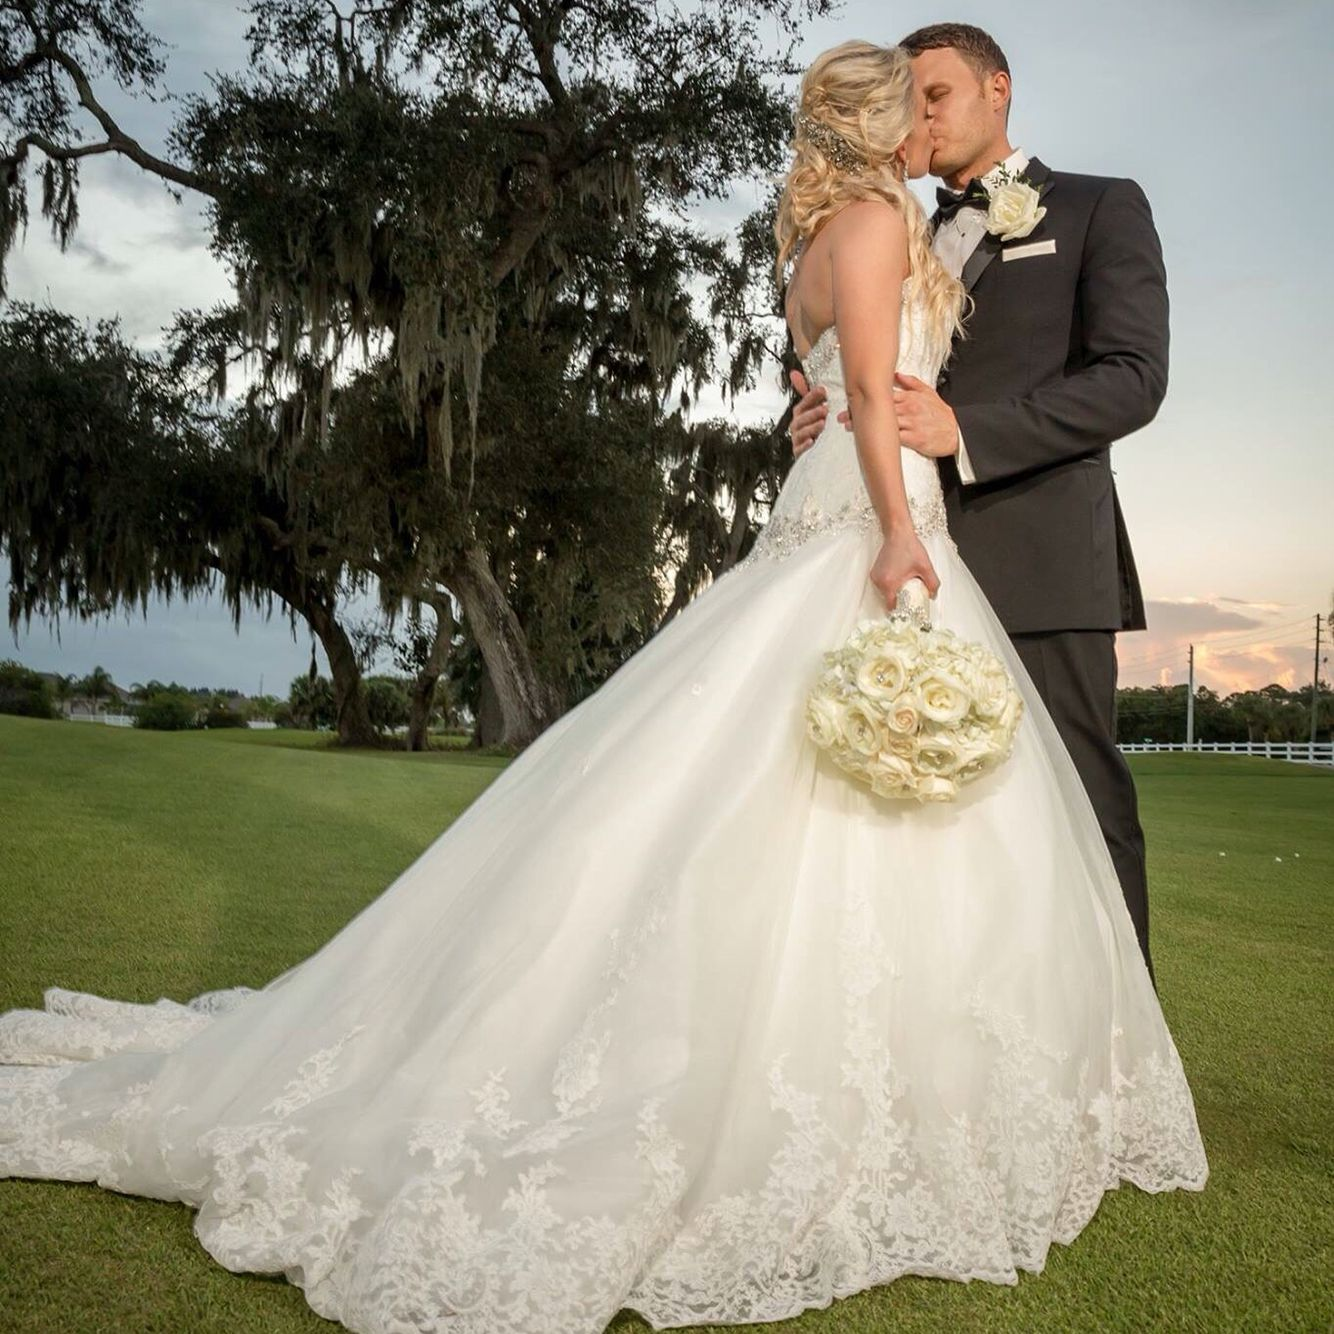 Wedding picture Golf Course #justmarried #brideandgroom  #wedding